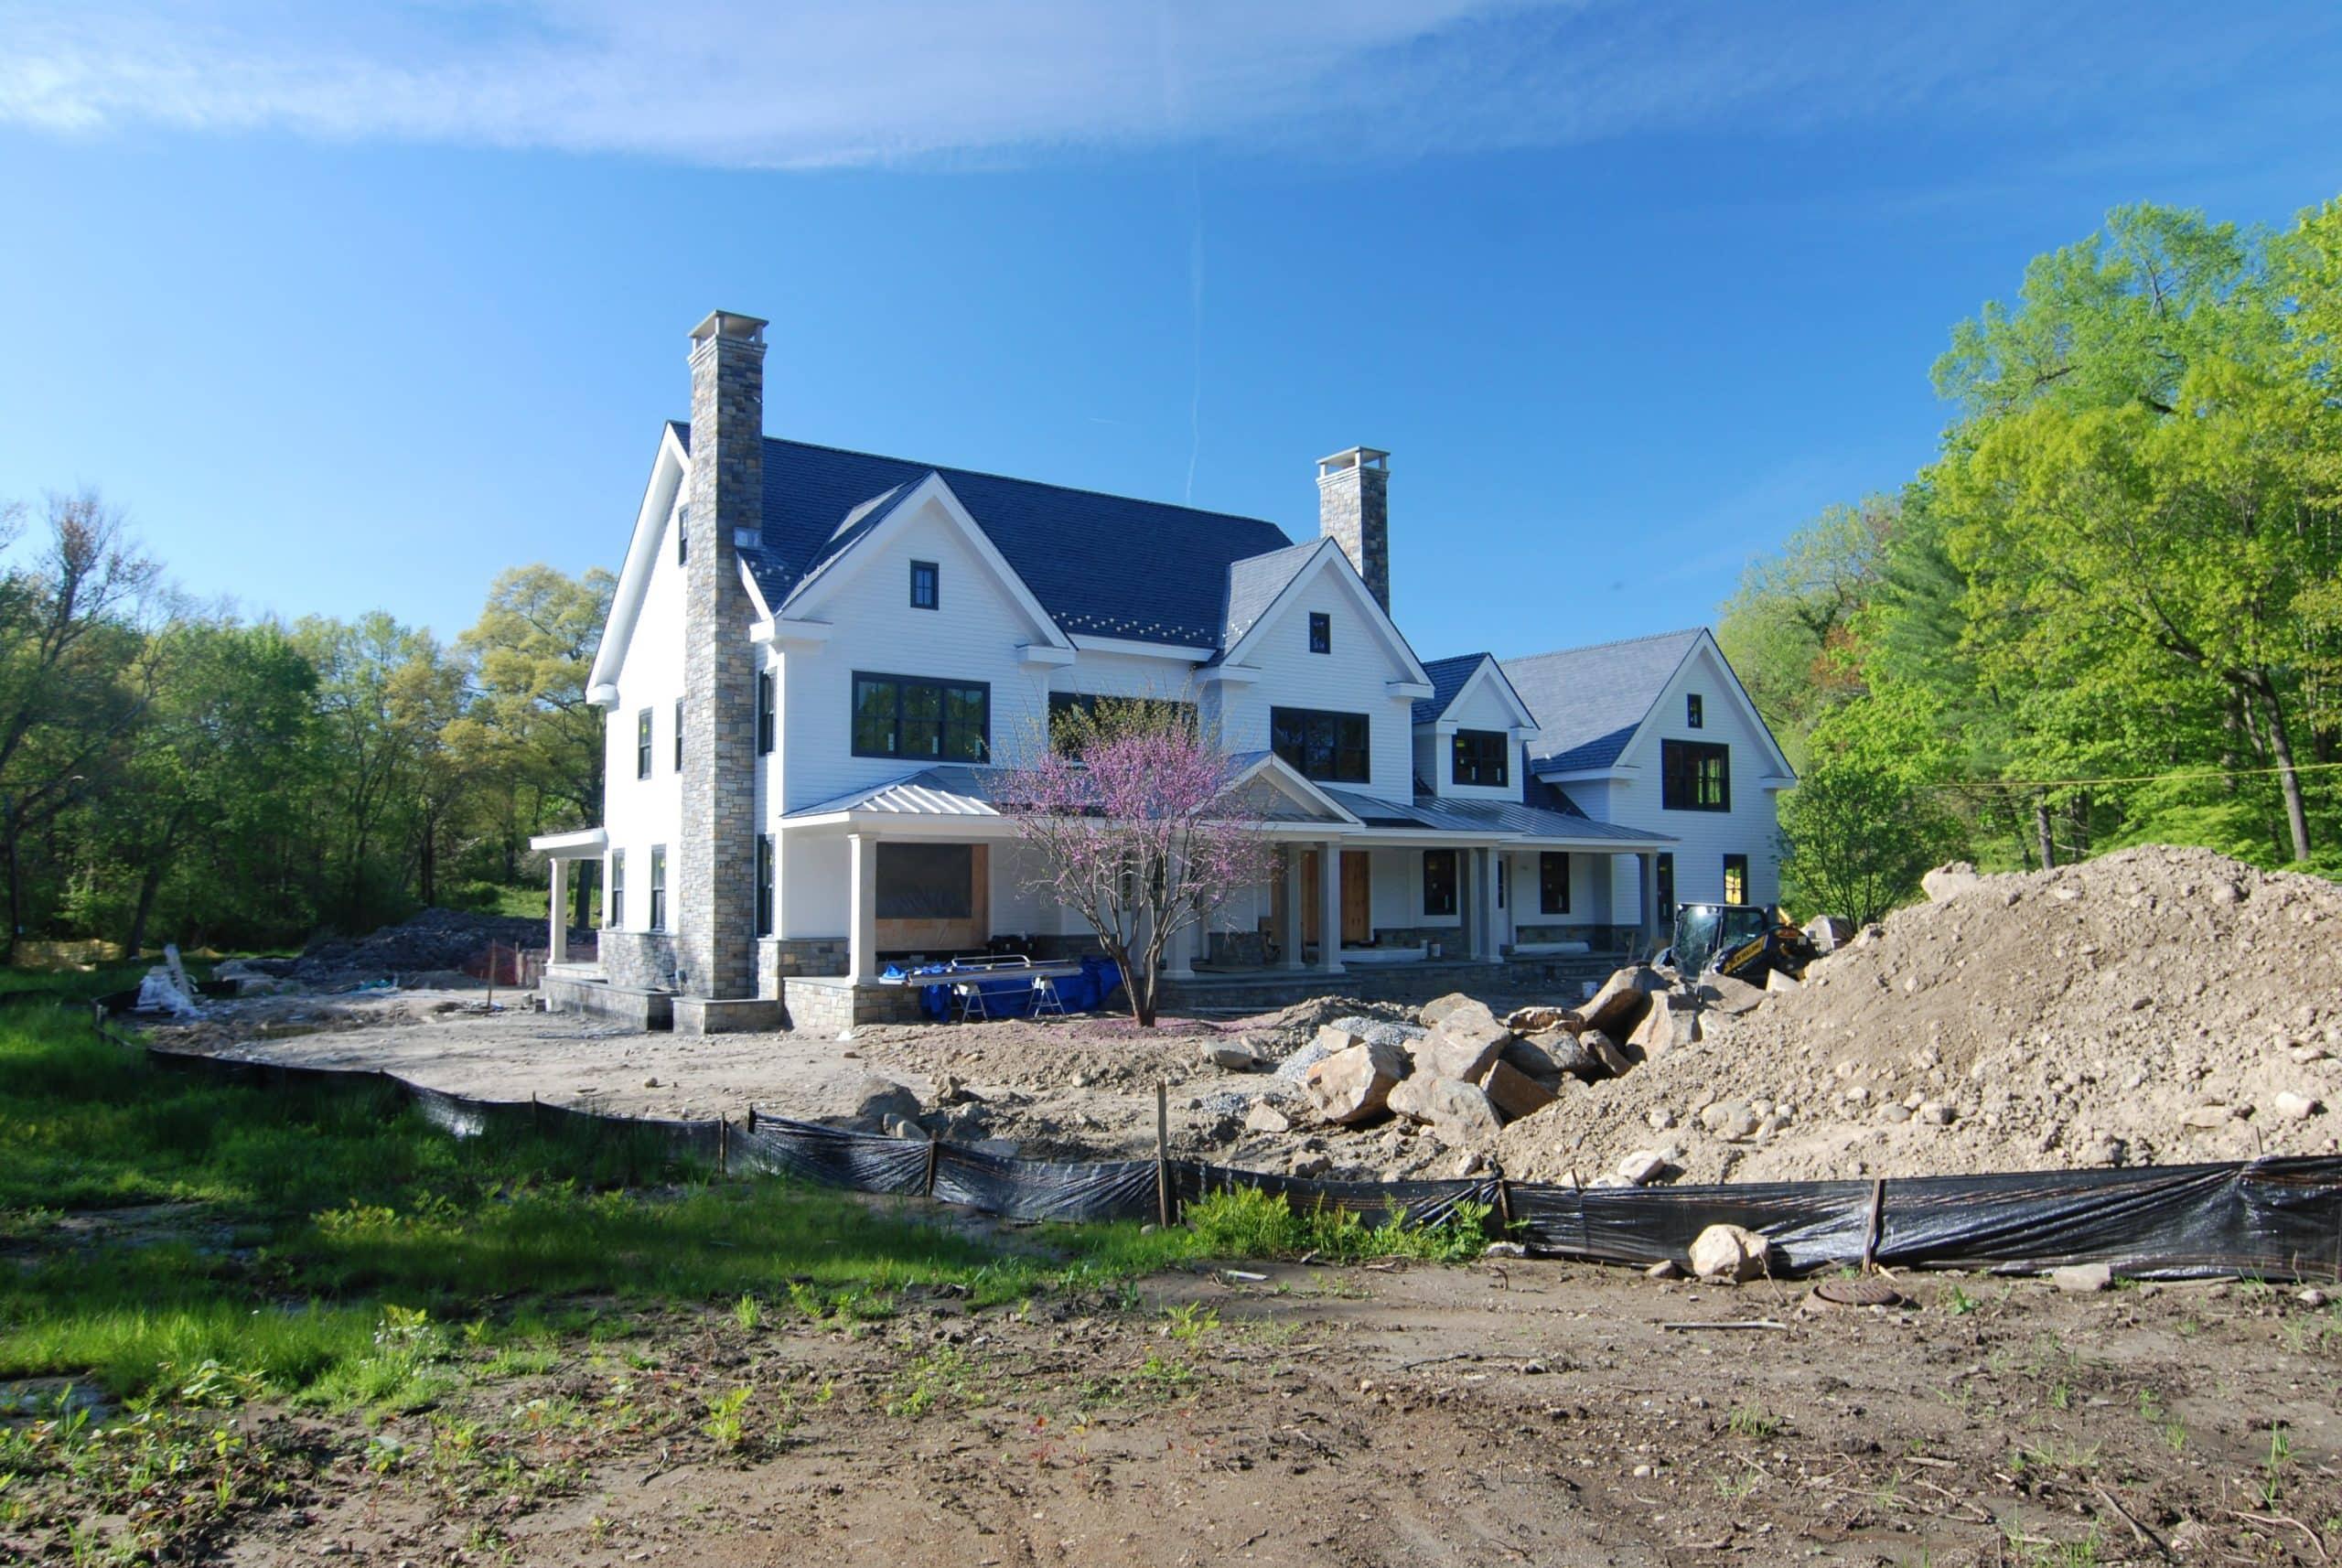 6 greenwich home construction in progress